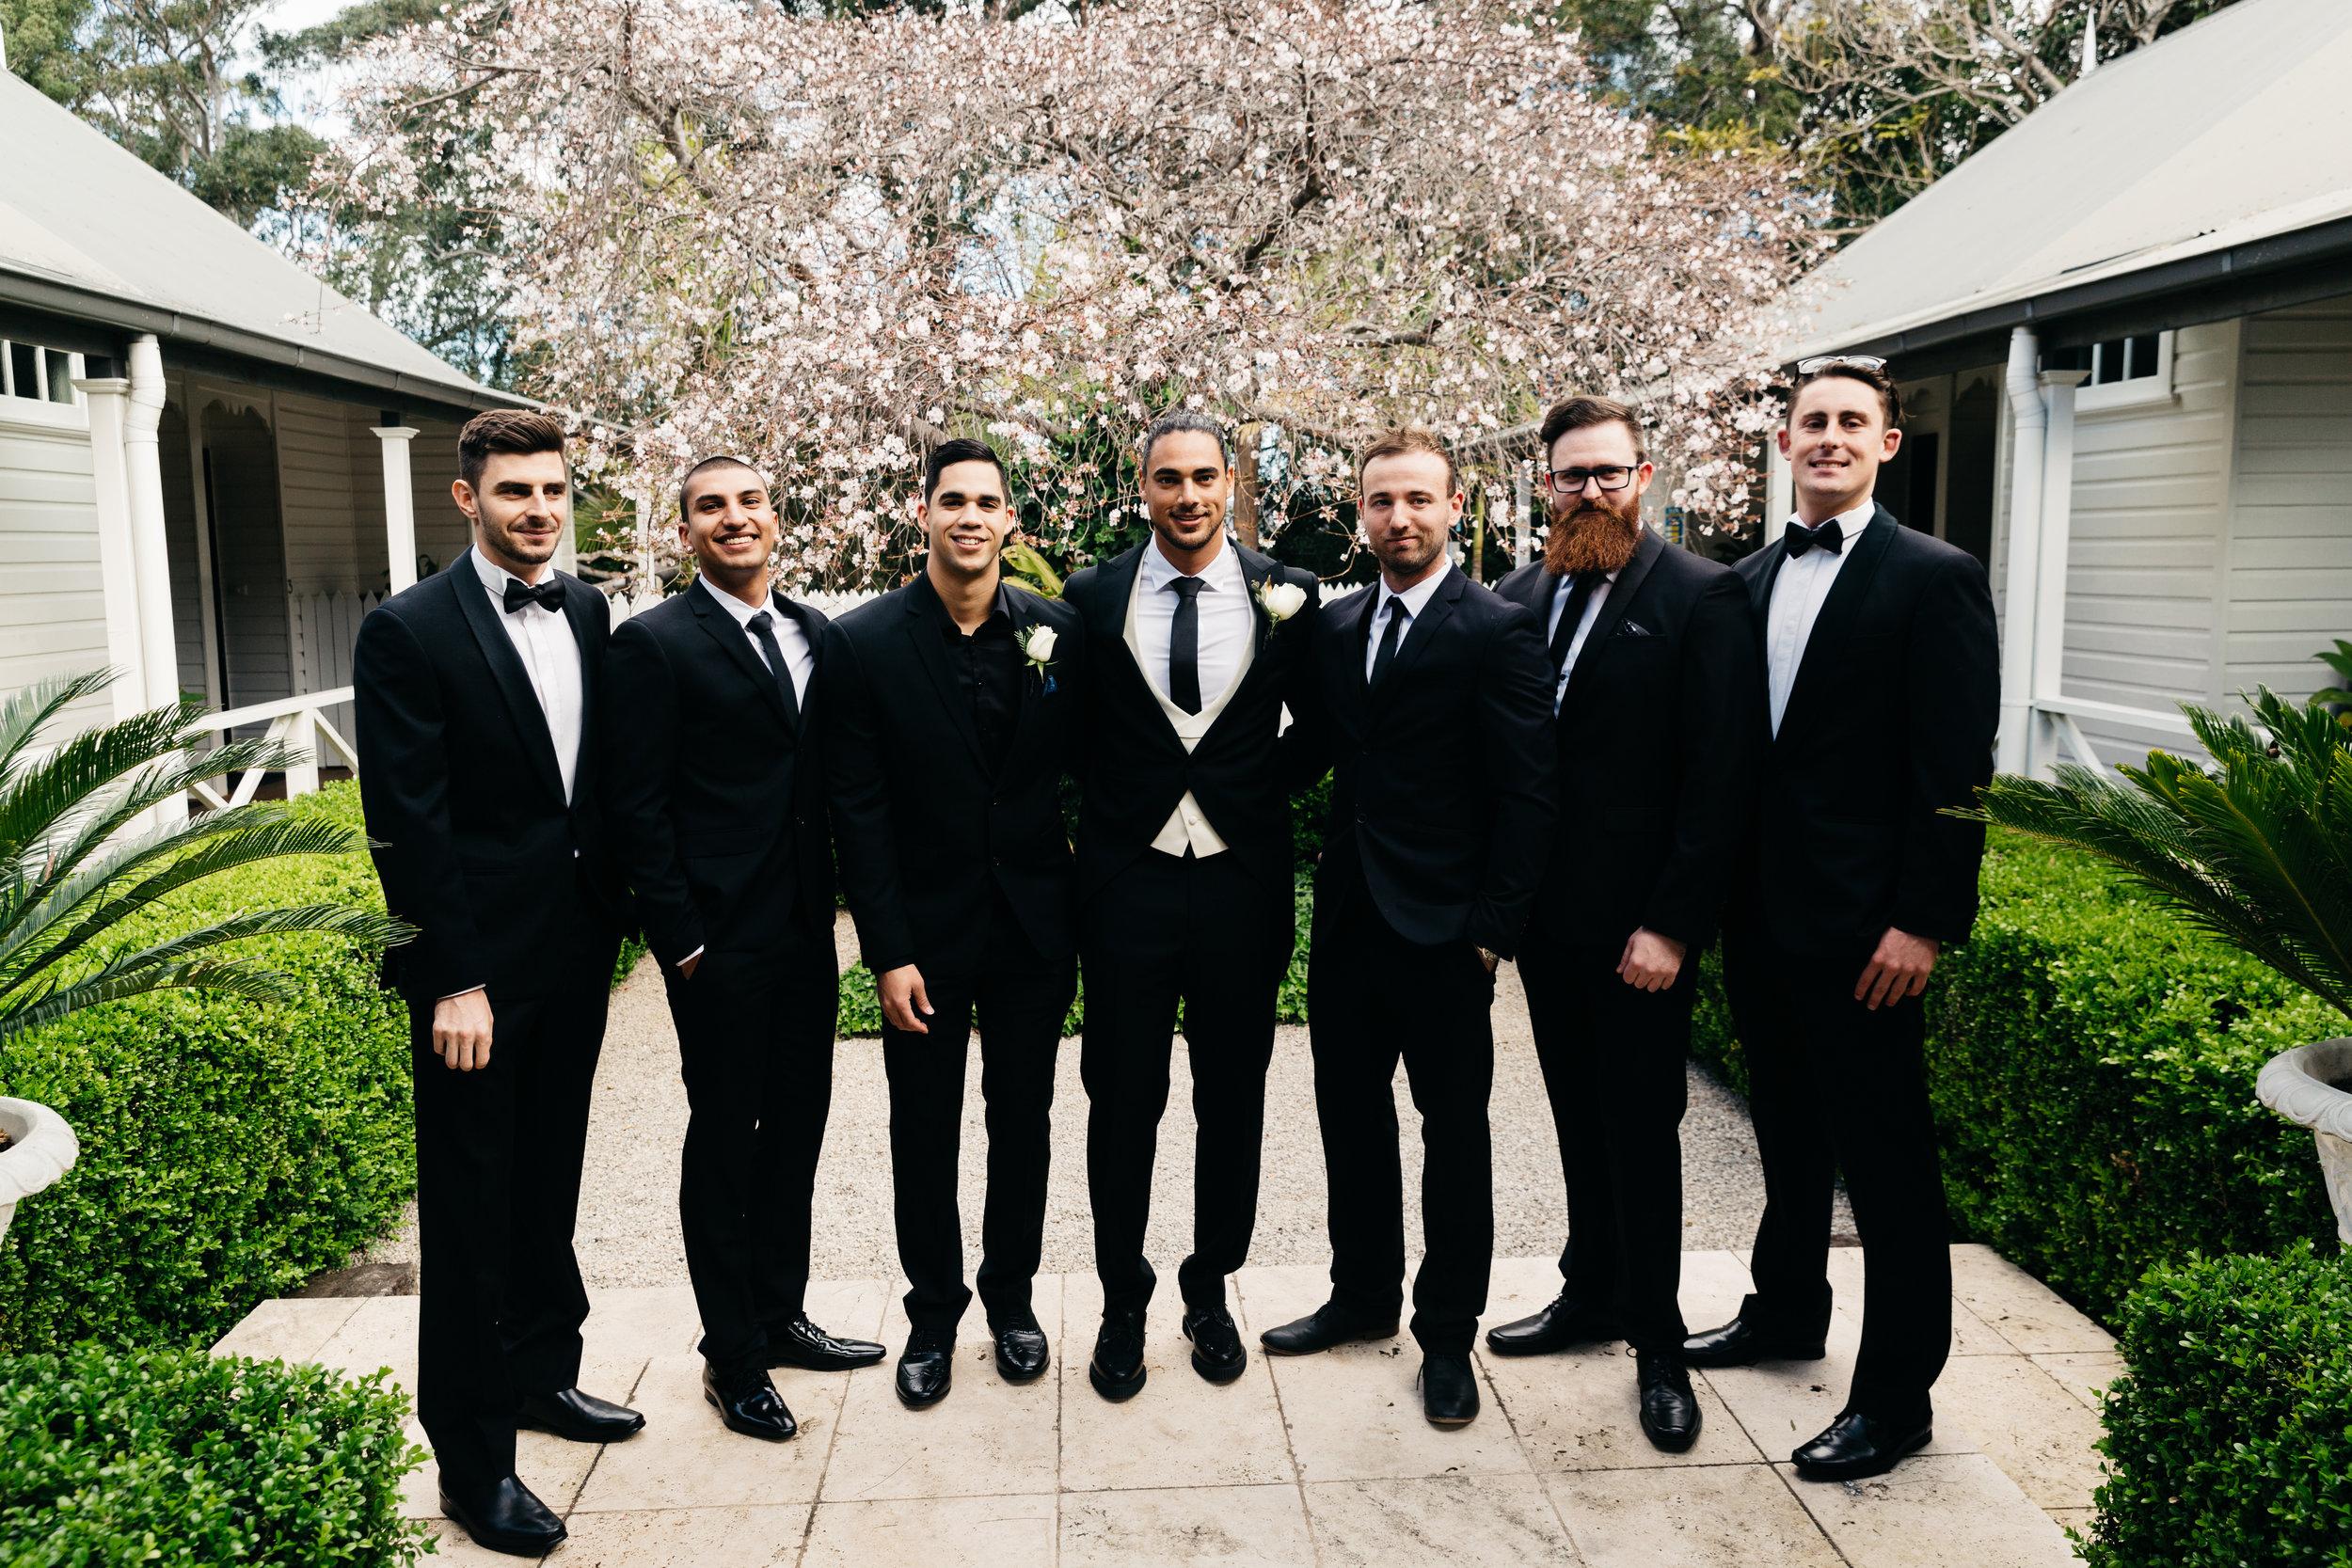 jandc_wedding-145.jpg